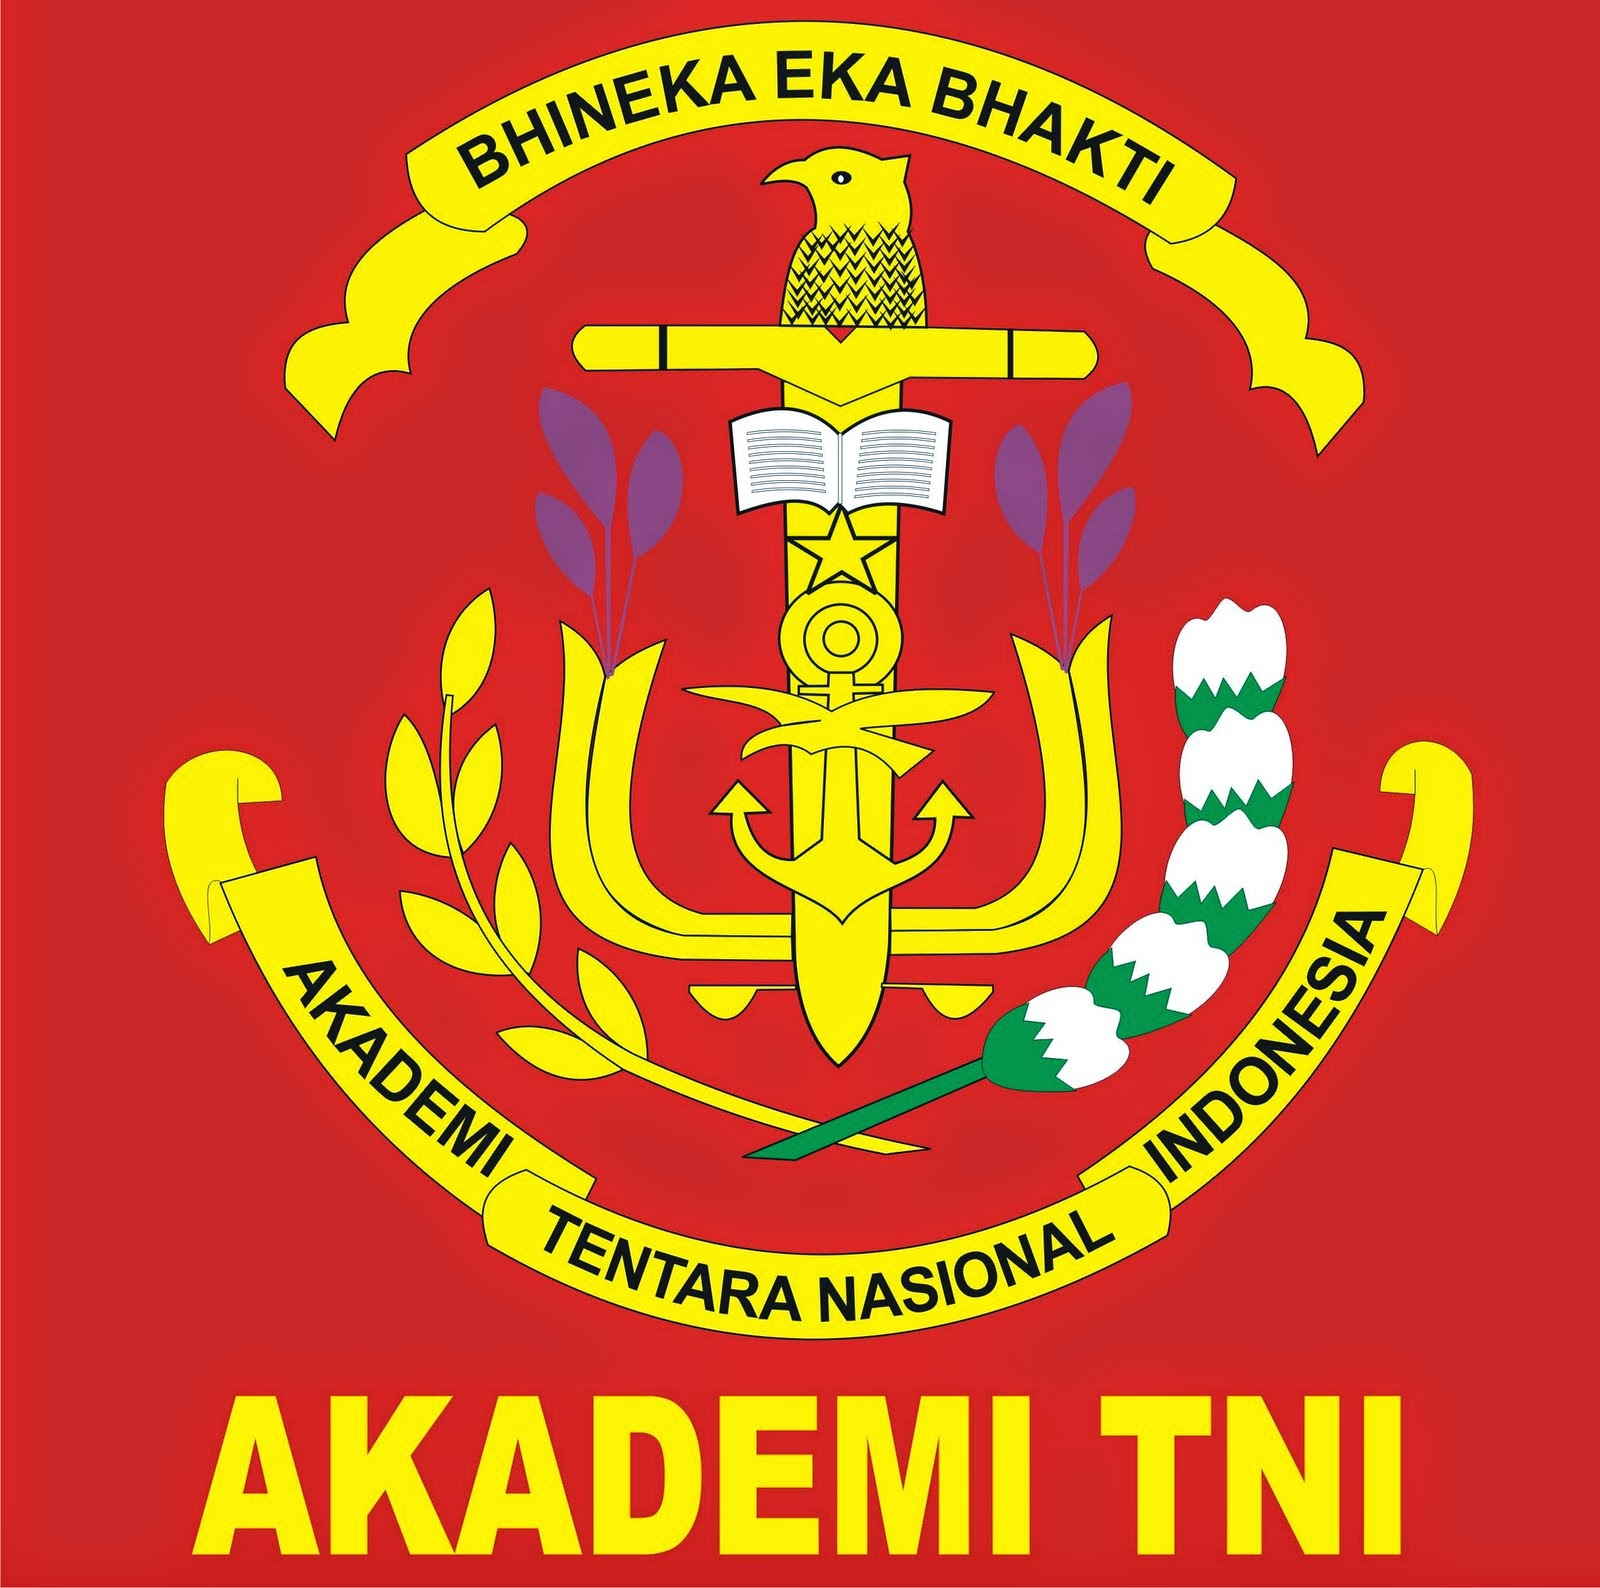 Jadwal Pendaftaran dan Persyaratan Penerimaan Calon Taruna TNI 2015